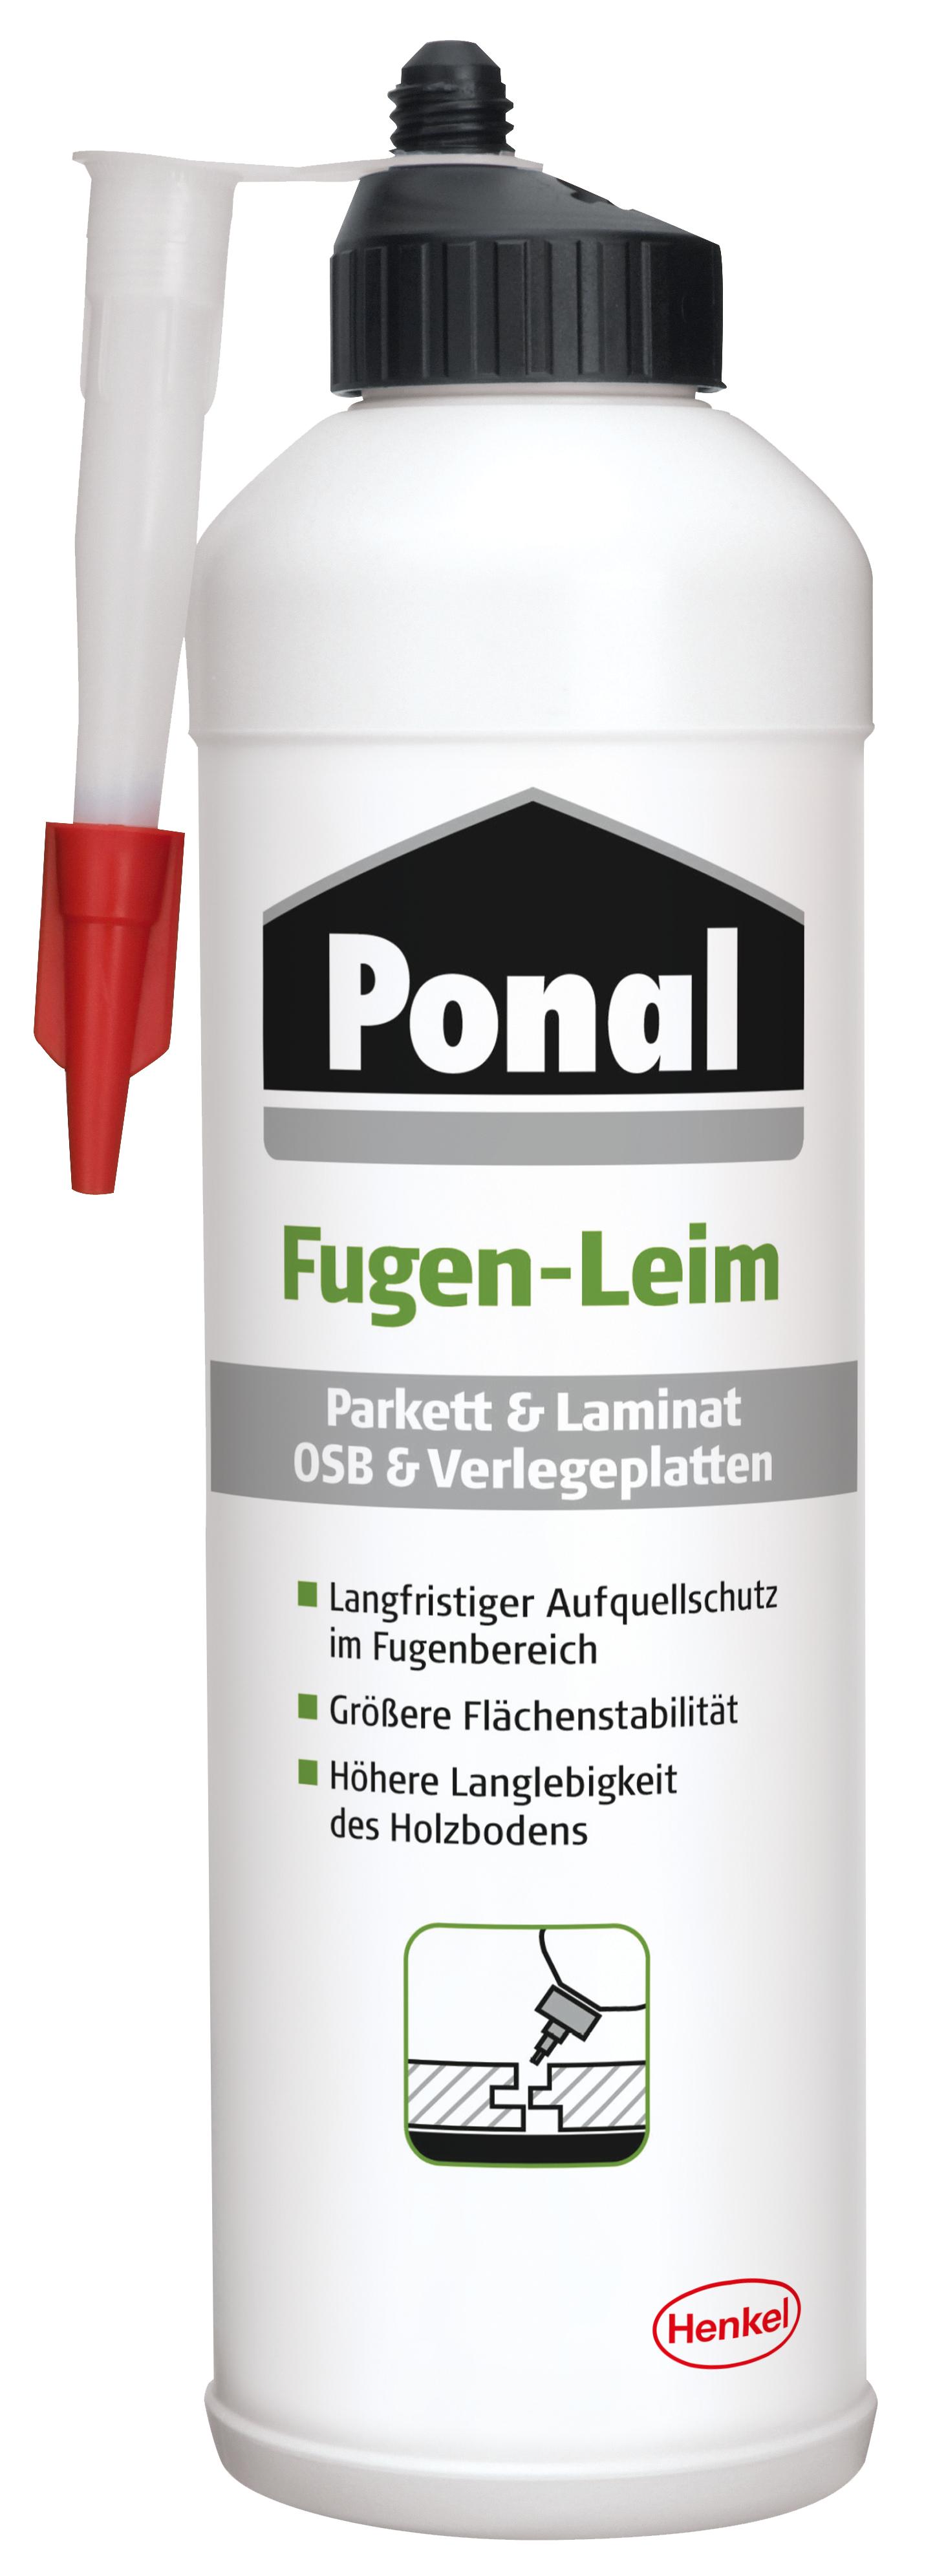 Ponal Fugen-Leim